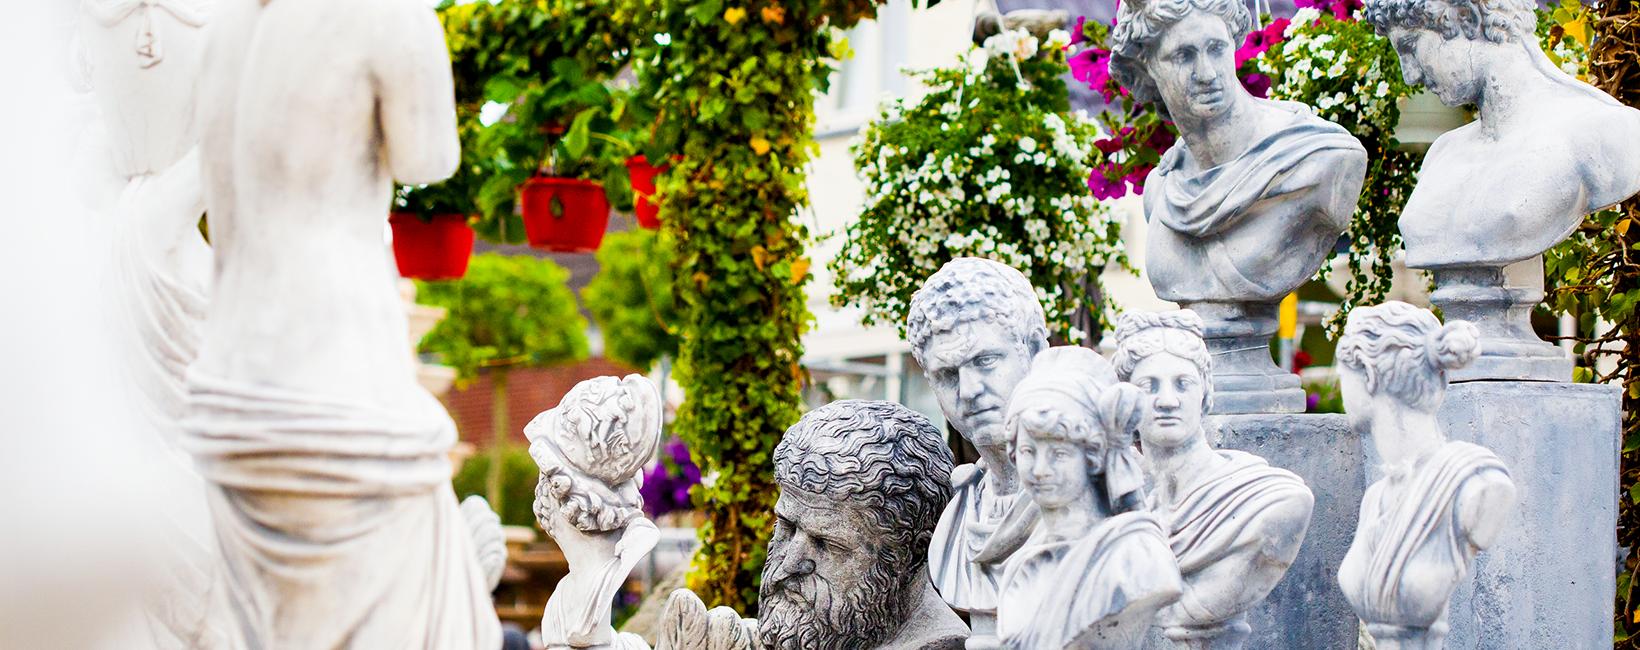 Tuindecoratie, Fonteinen en tuinbeelden Jose